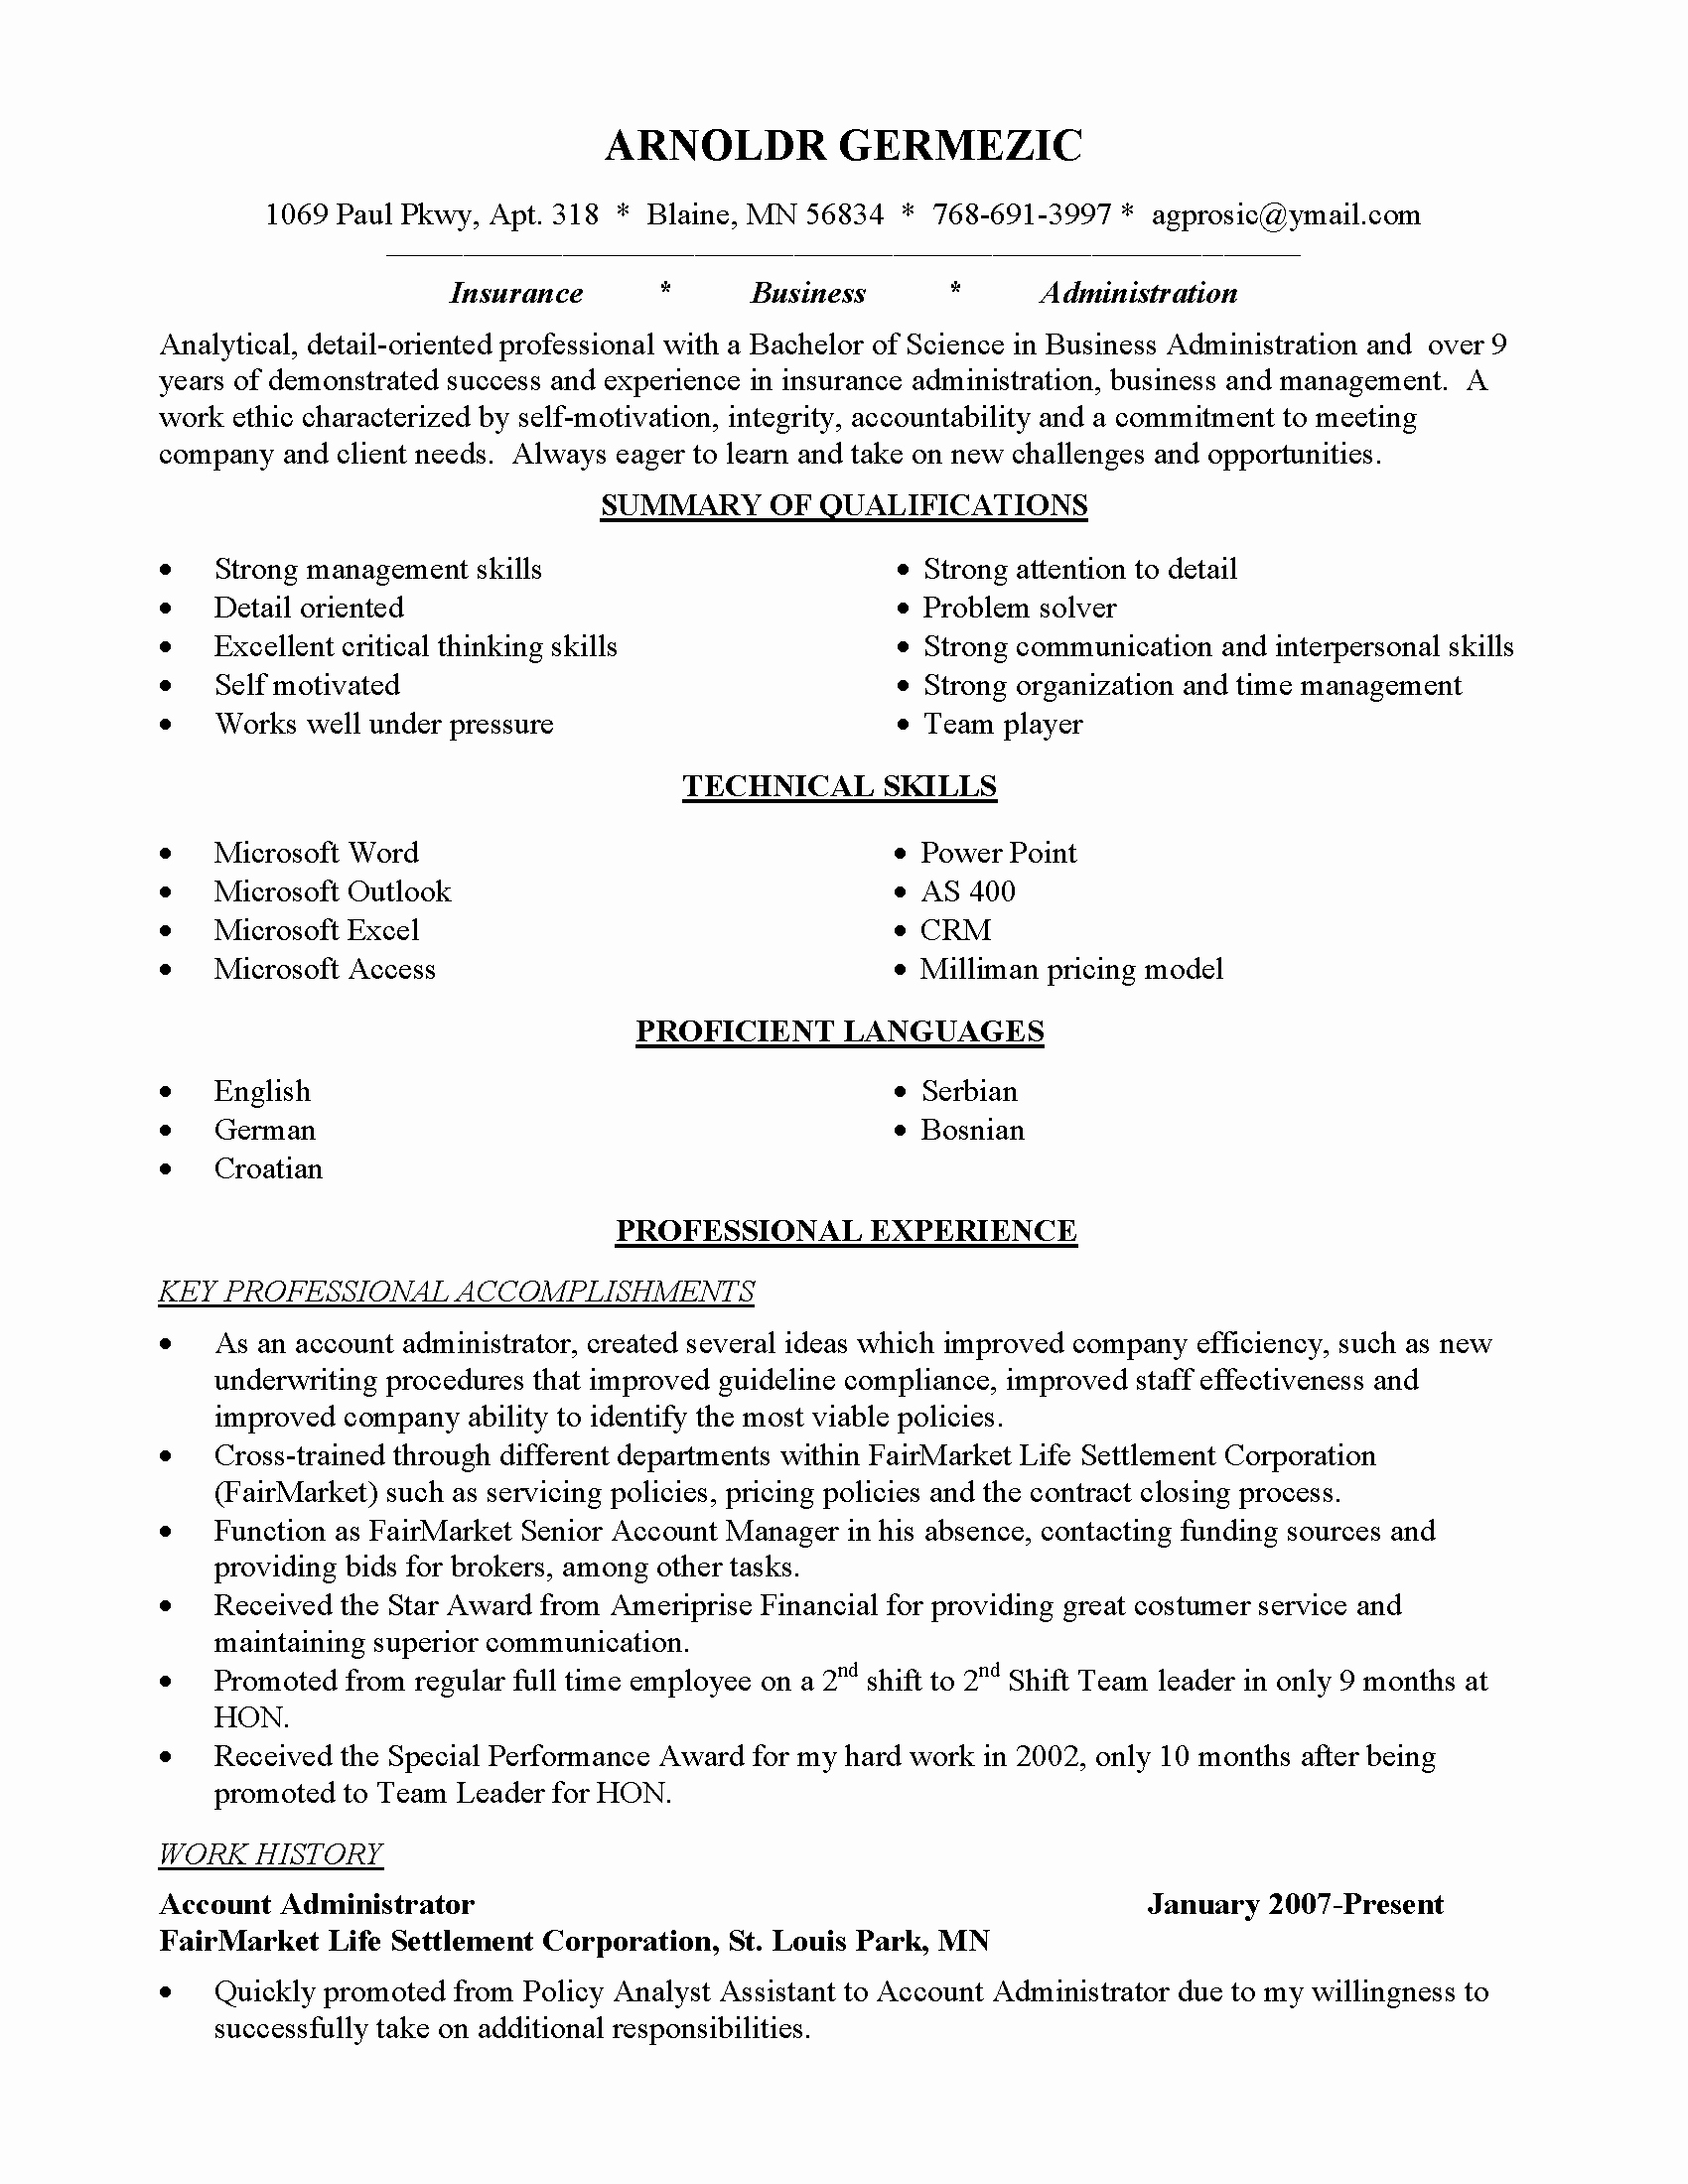 Resume Examples Career Change 2018